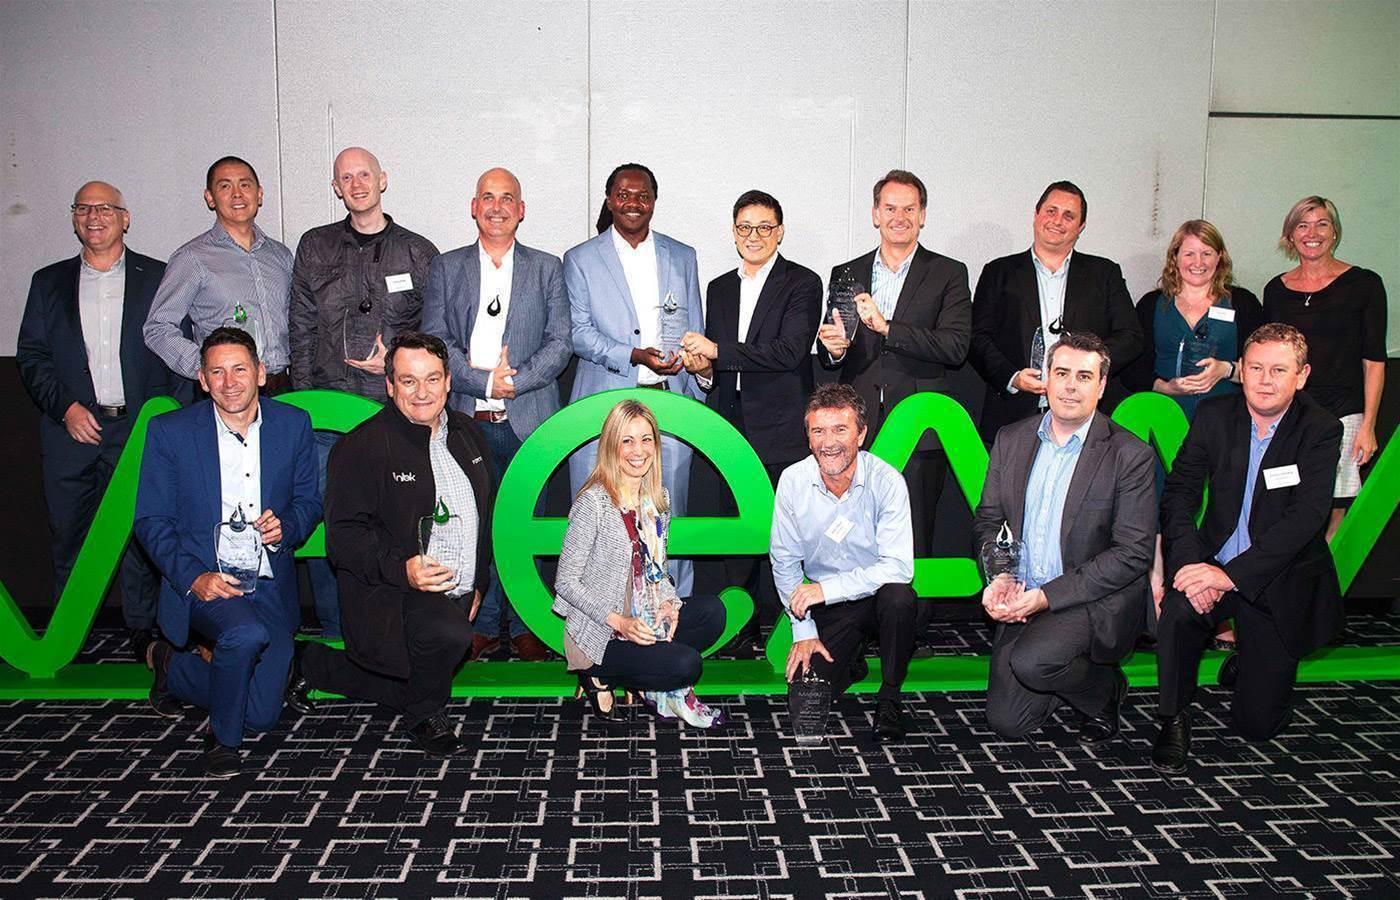 Veeam names Telstra, Ingram Micro, Vintek, Blue Apache among its top Australian partners at awards night in Sydney